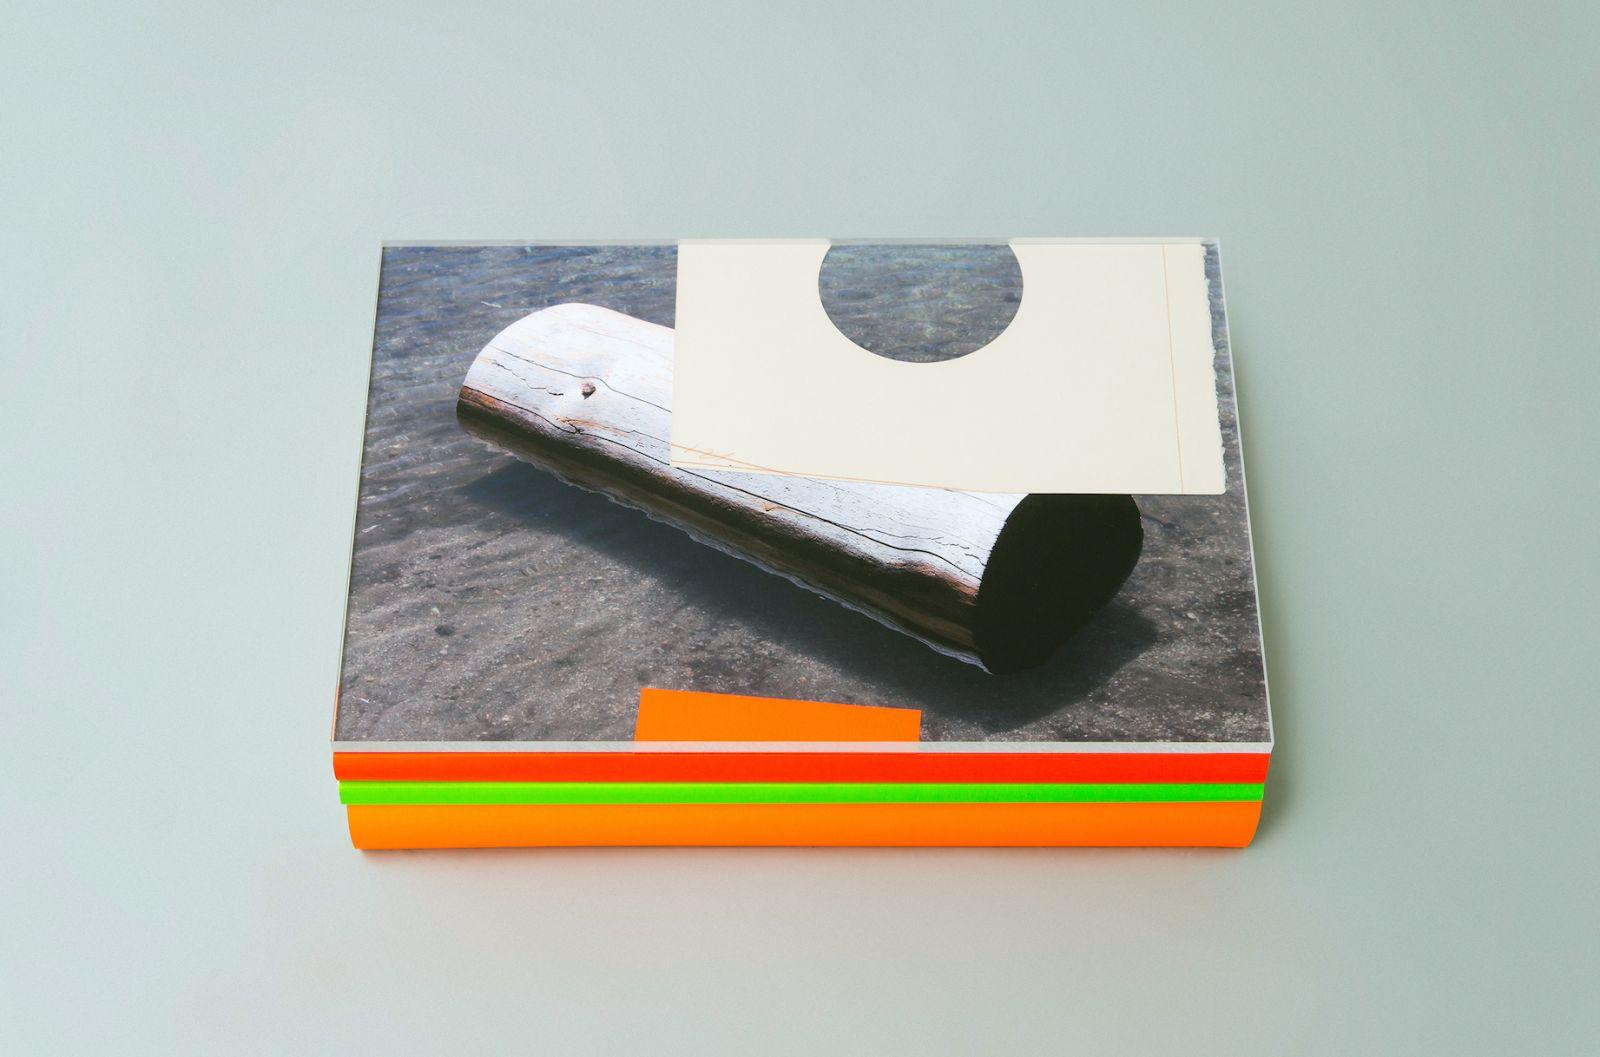 benoit-gehanne-mille-feuilles-08-2014-photographies-papier-decoupes-plexiglass-32x45-cm-a23a47063e2a3b5a607415faadc4e6b4